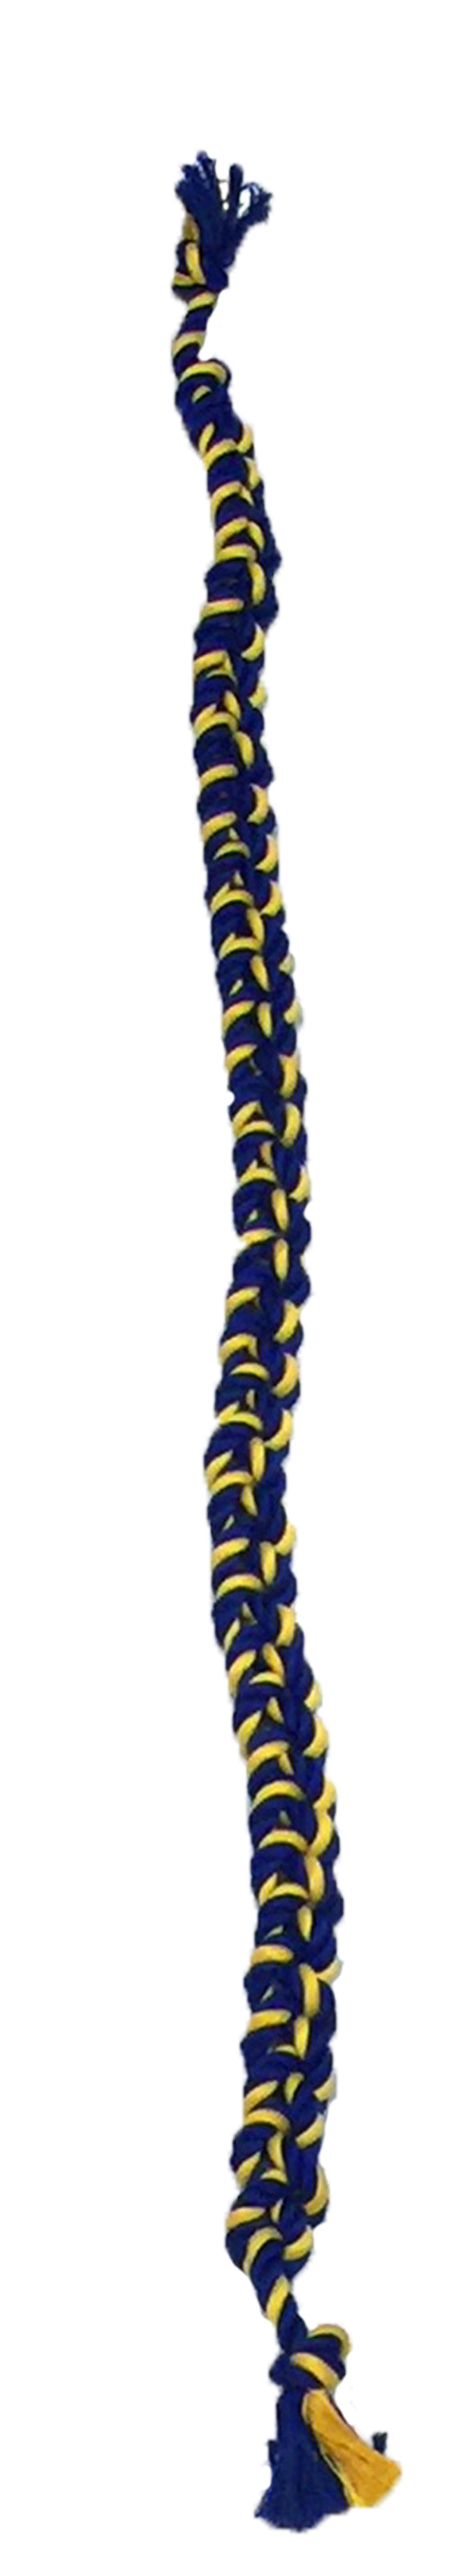 Braided Cotton Rope Boa Large 120cm